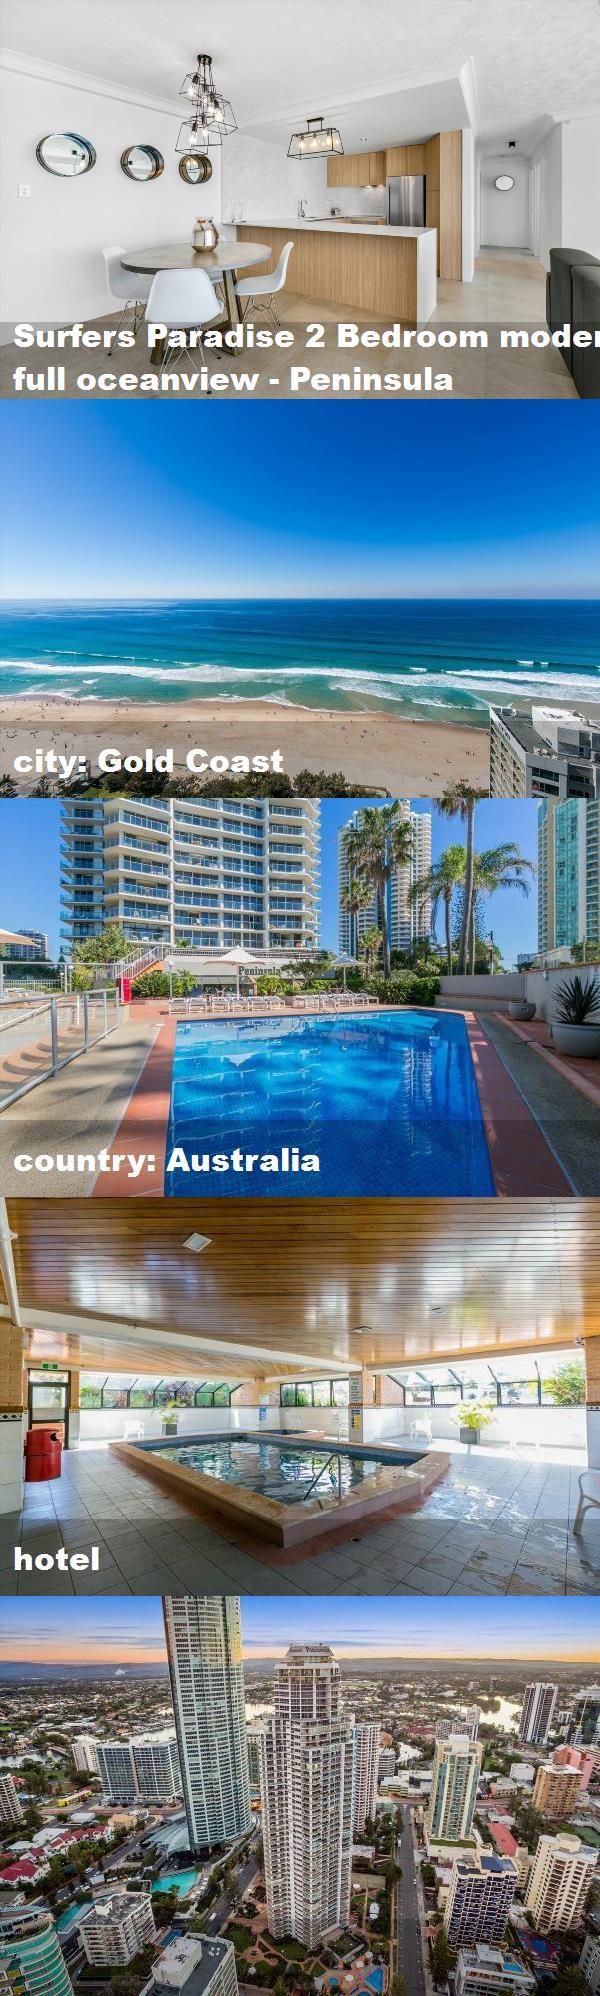 Surfers Paradise 2 Bedroom Modern Full Oceanview Peninsula City Gold Coast Country Australia Hotel Australia Hotels Surfers Paradise Australia